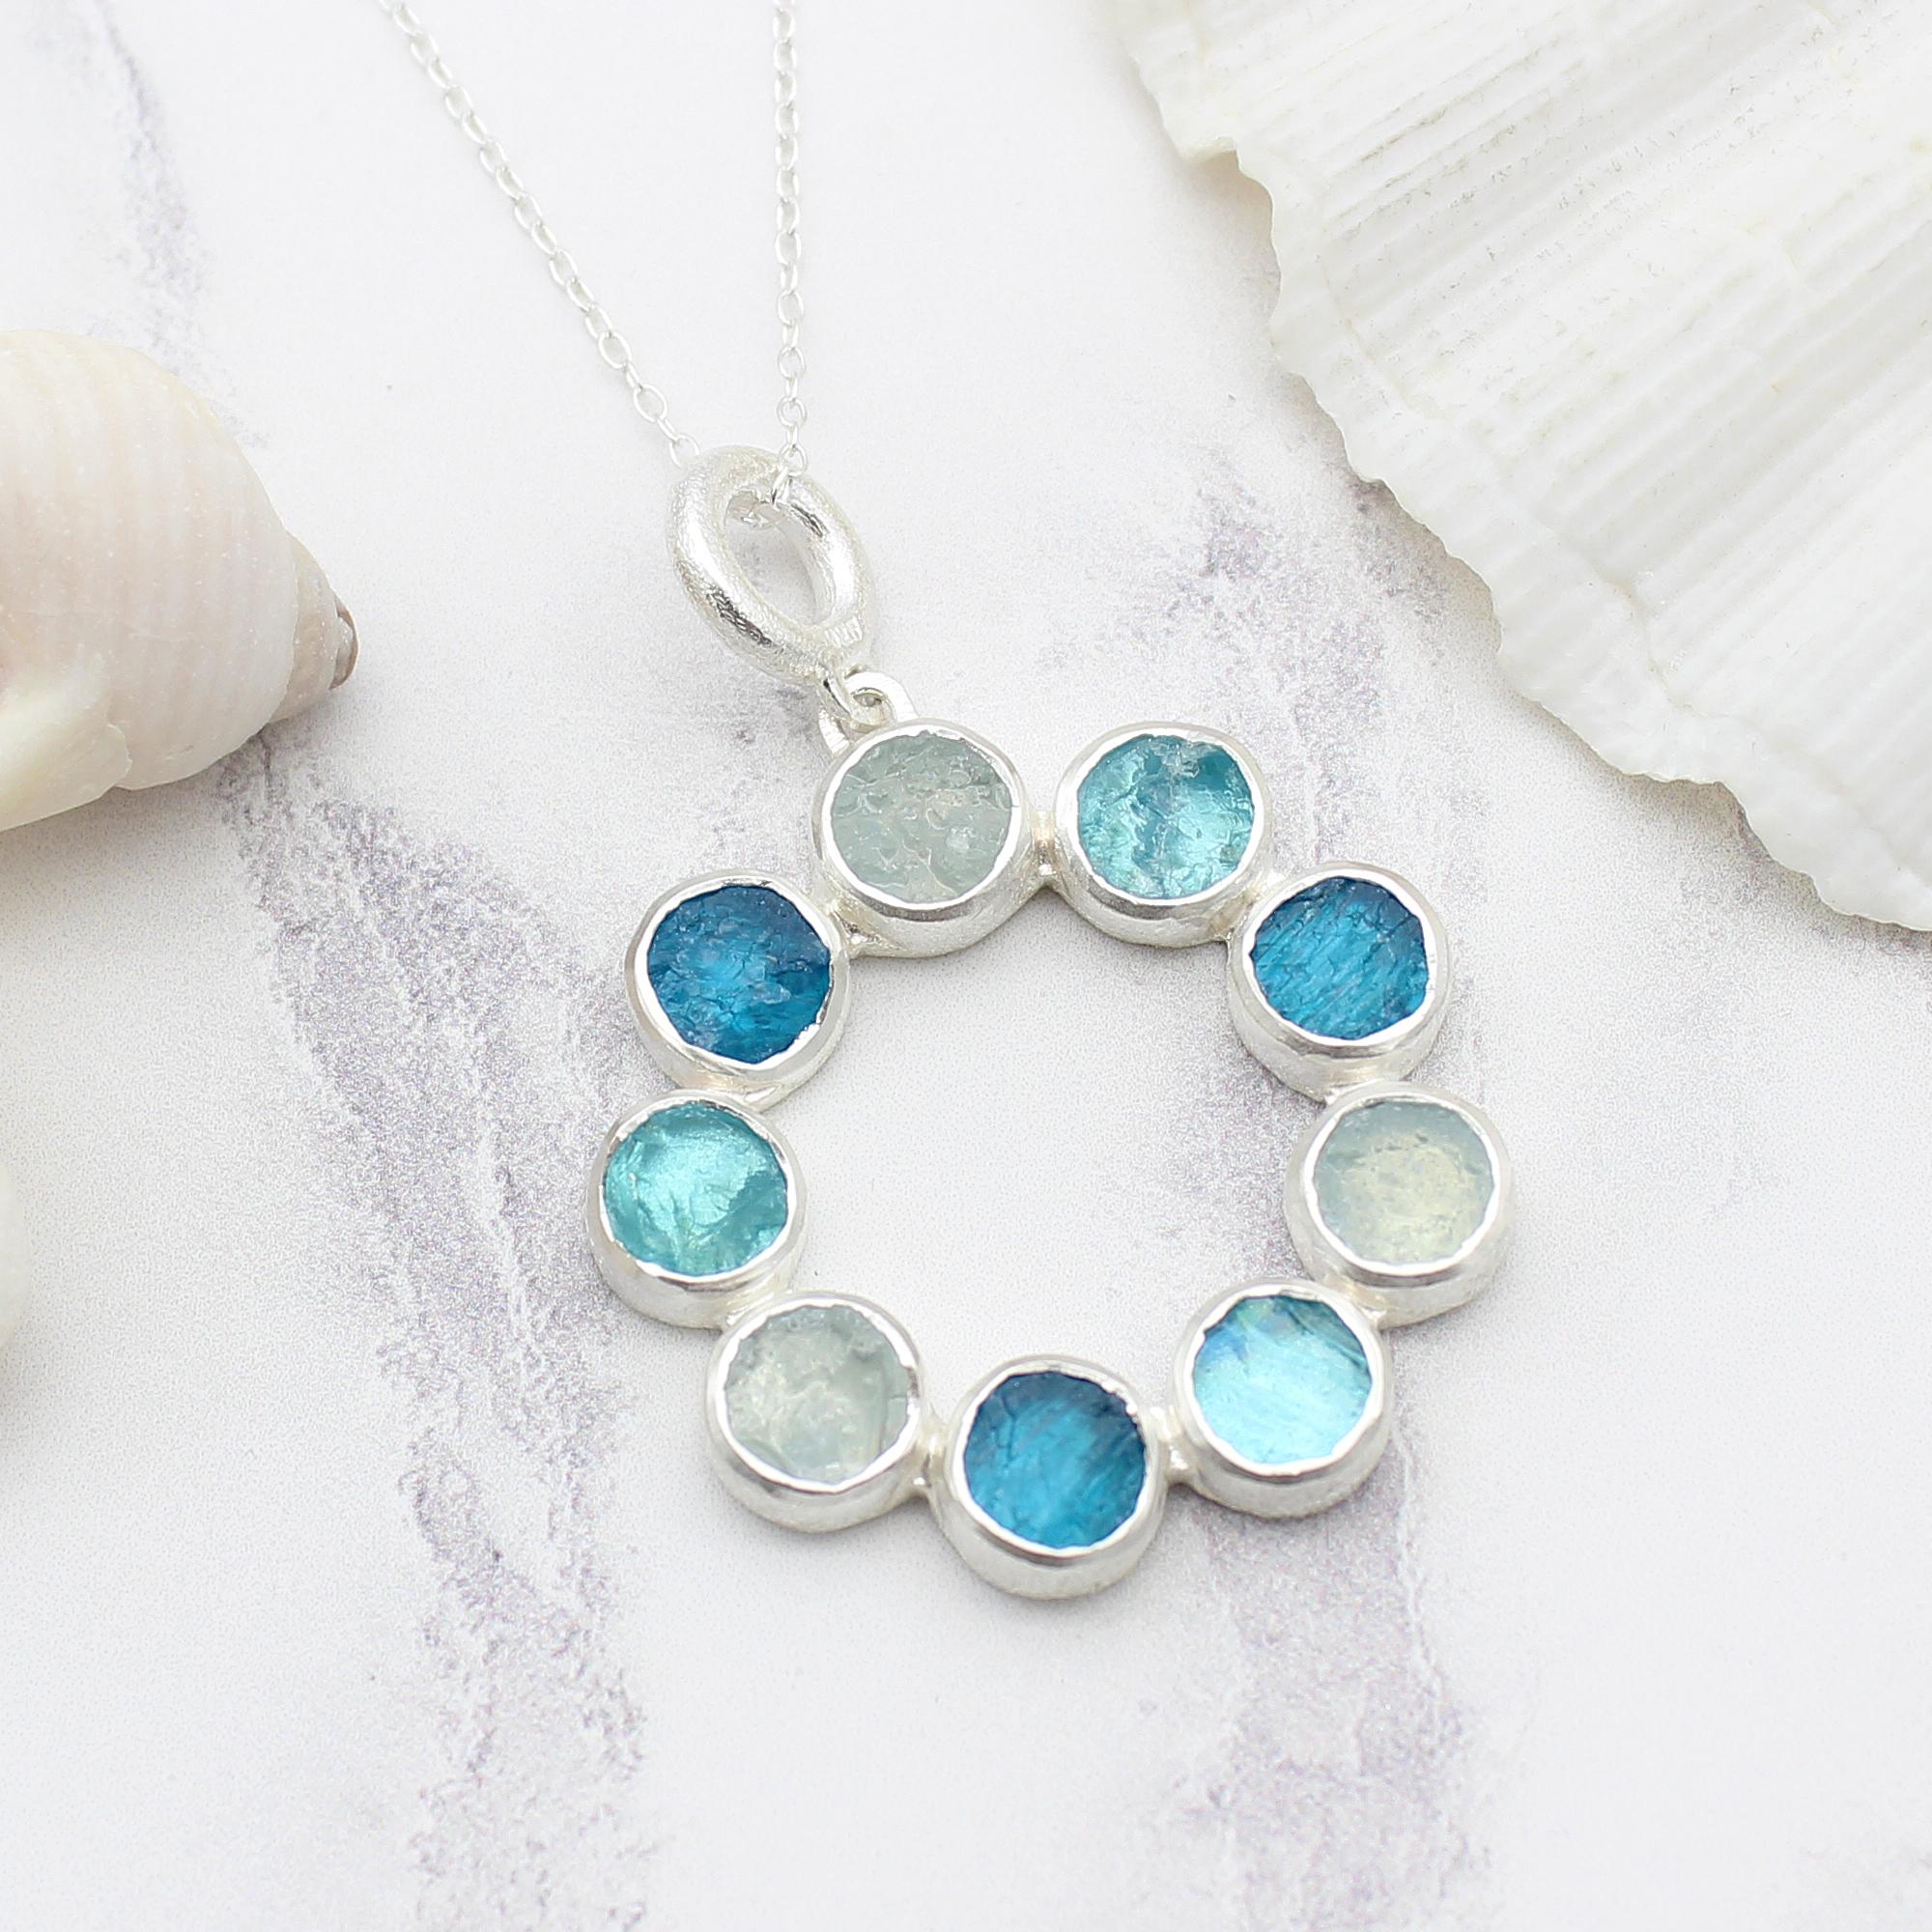 Aquamarine, Apatite & Neon Apatite Gemstone Sterling Silver Pendant Necklace